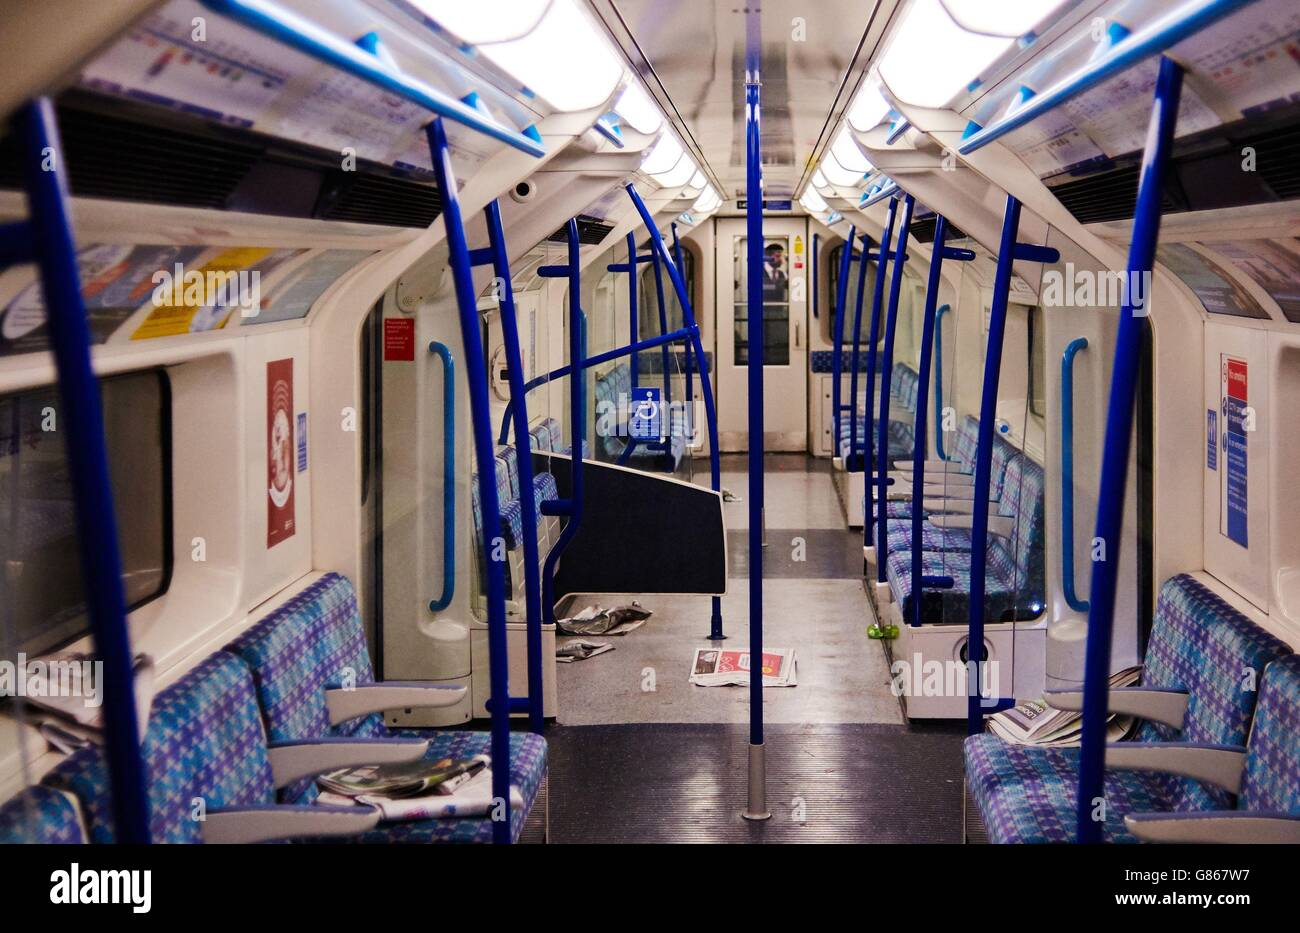 Tube strike - Stock Image